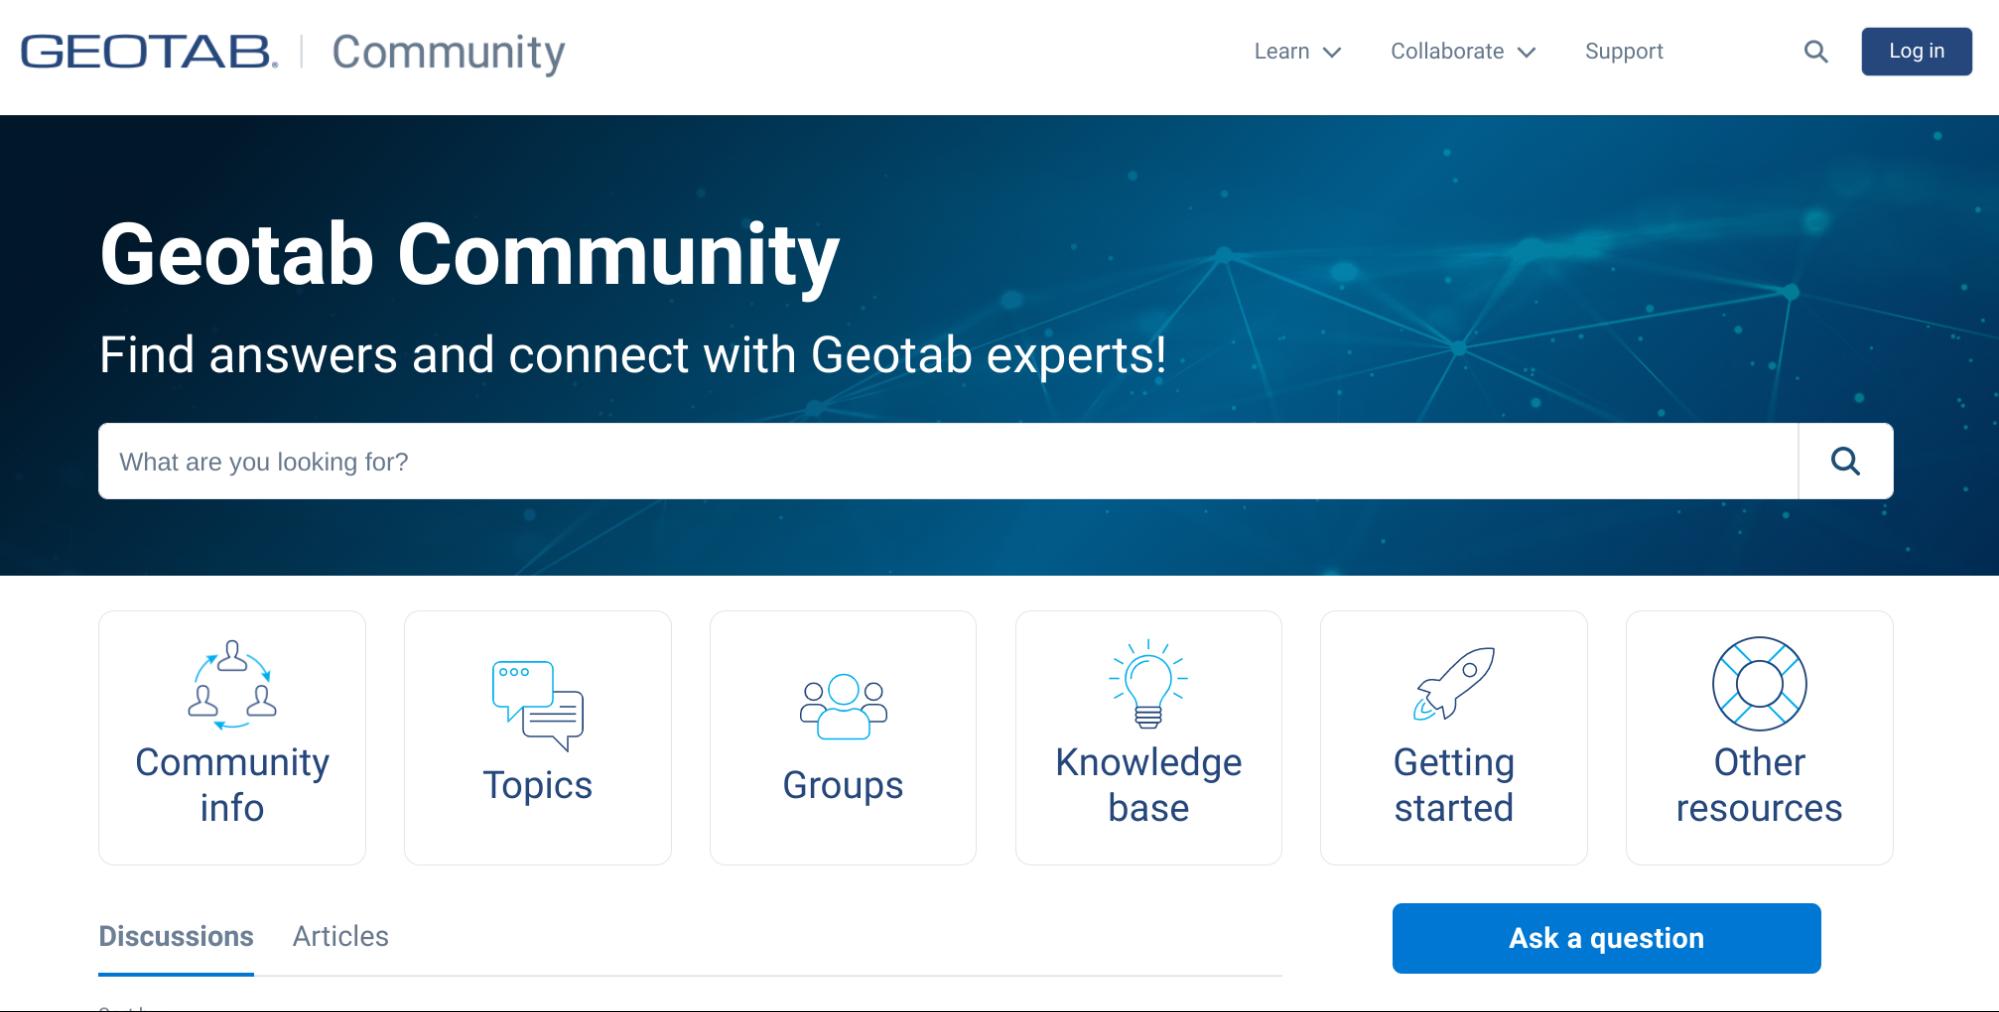 Geotab Community